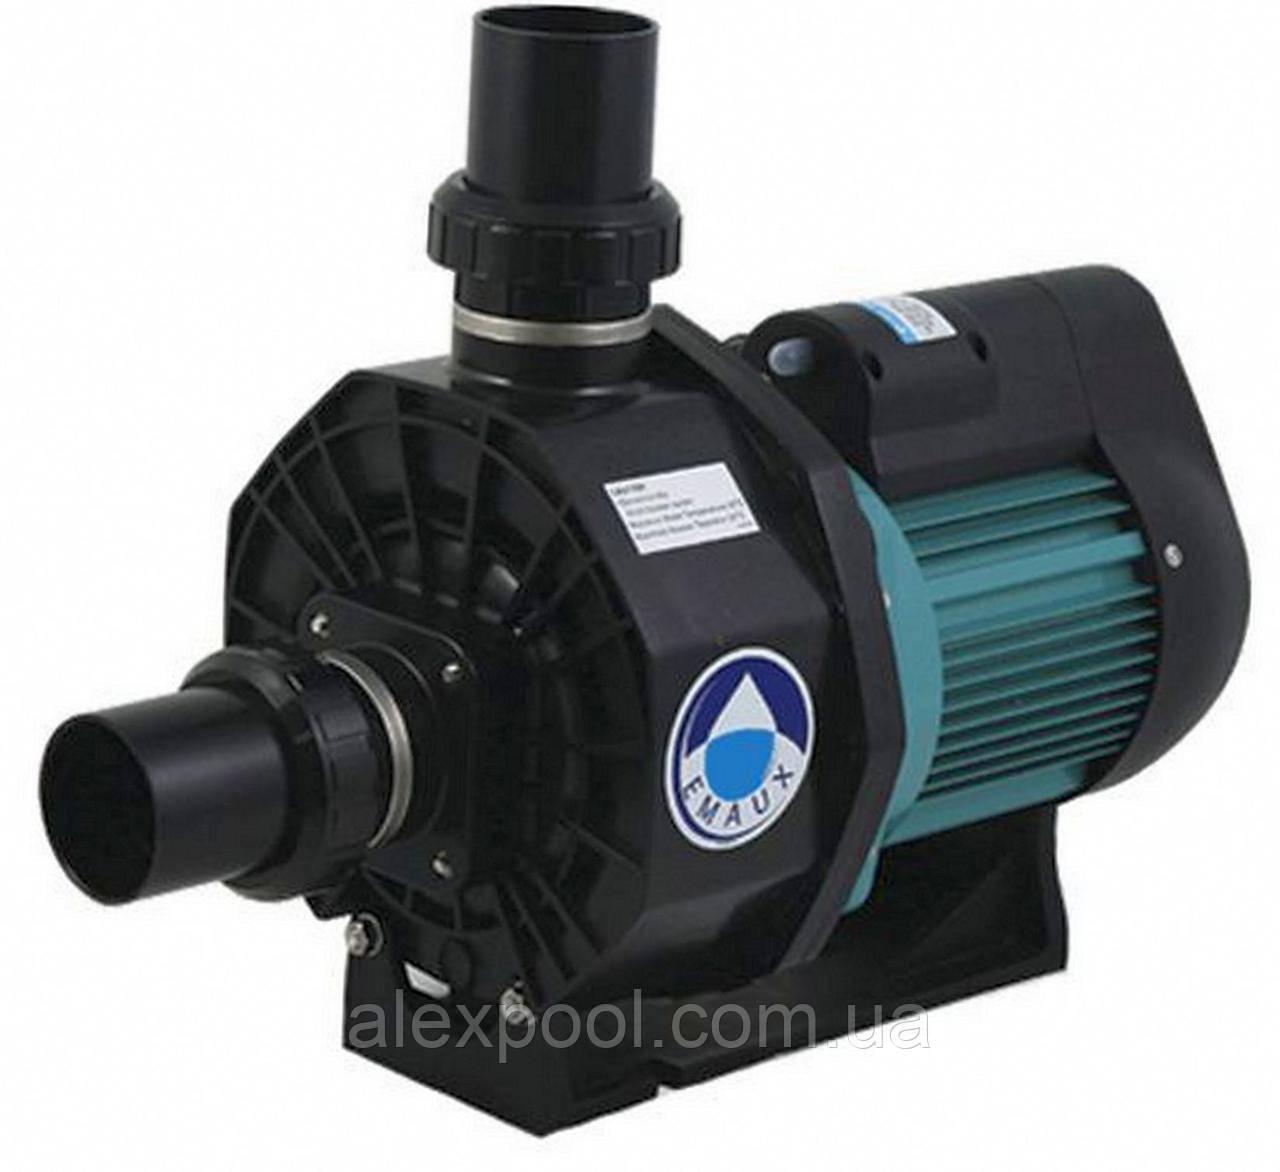 Насос Emaux SR30 (SR30, 31 м. куб/год, 2.18 кВт, 3,0 HP, 220В)